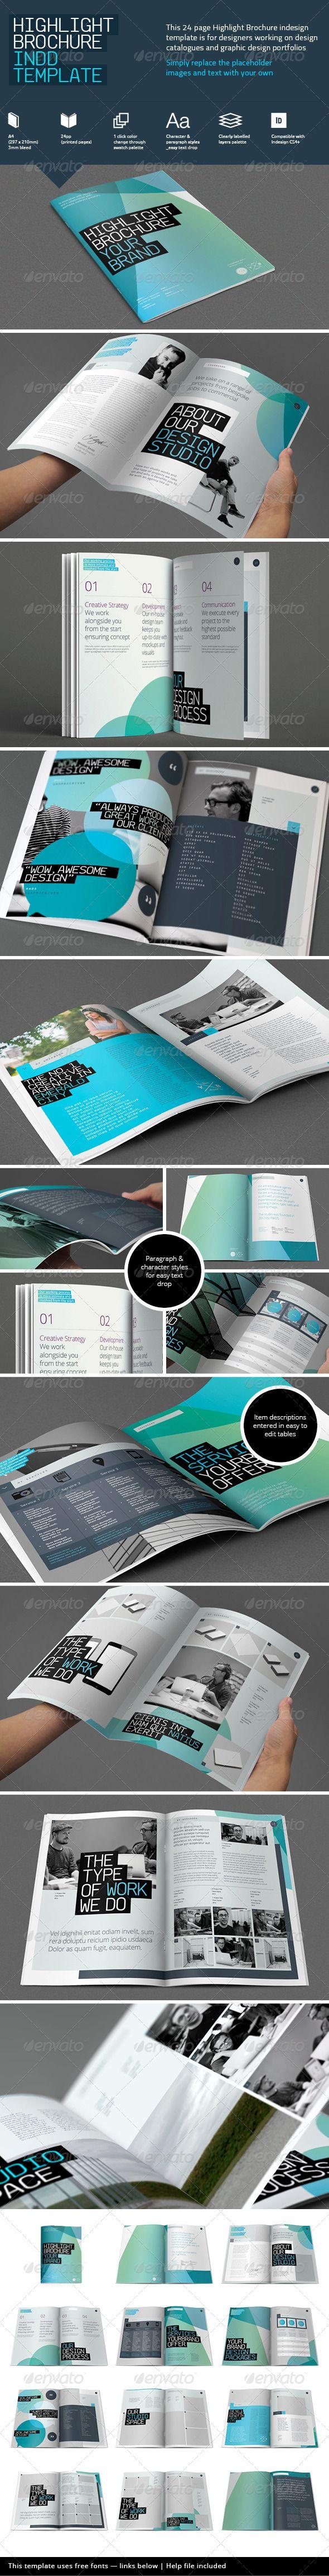 Highlight Brochure Template | Print templates and Brochure template